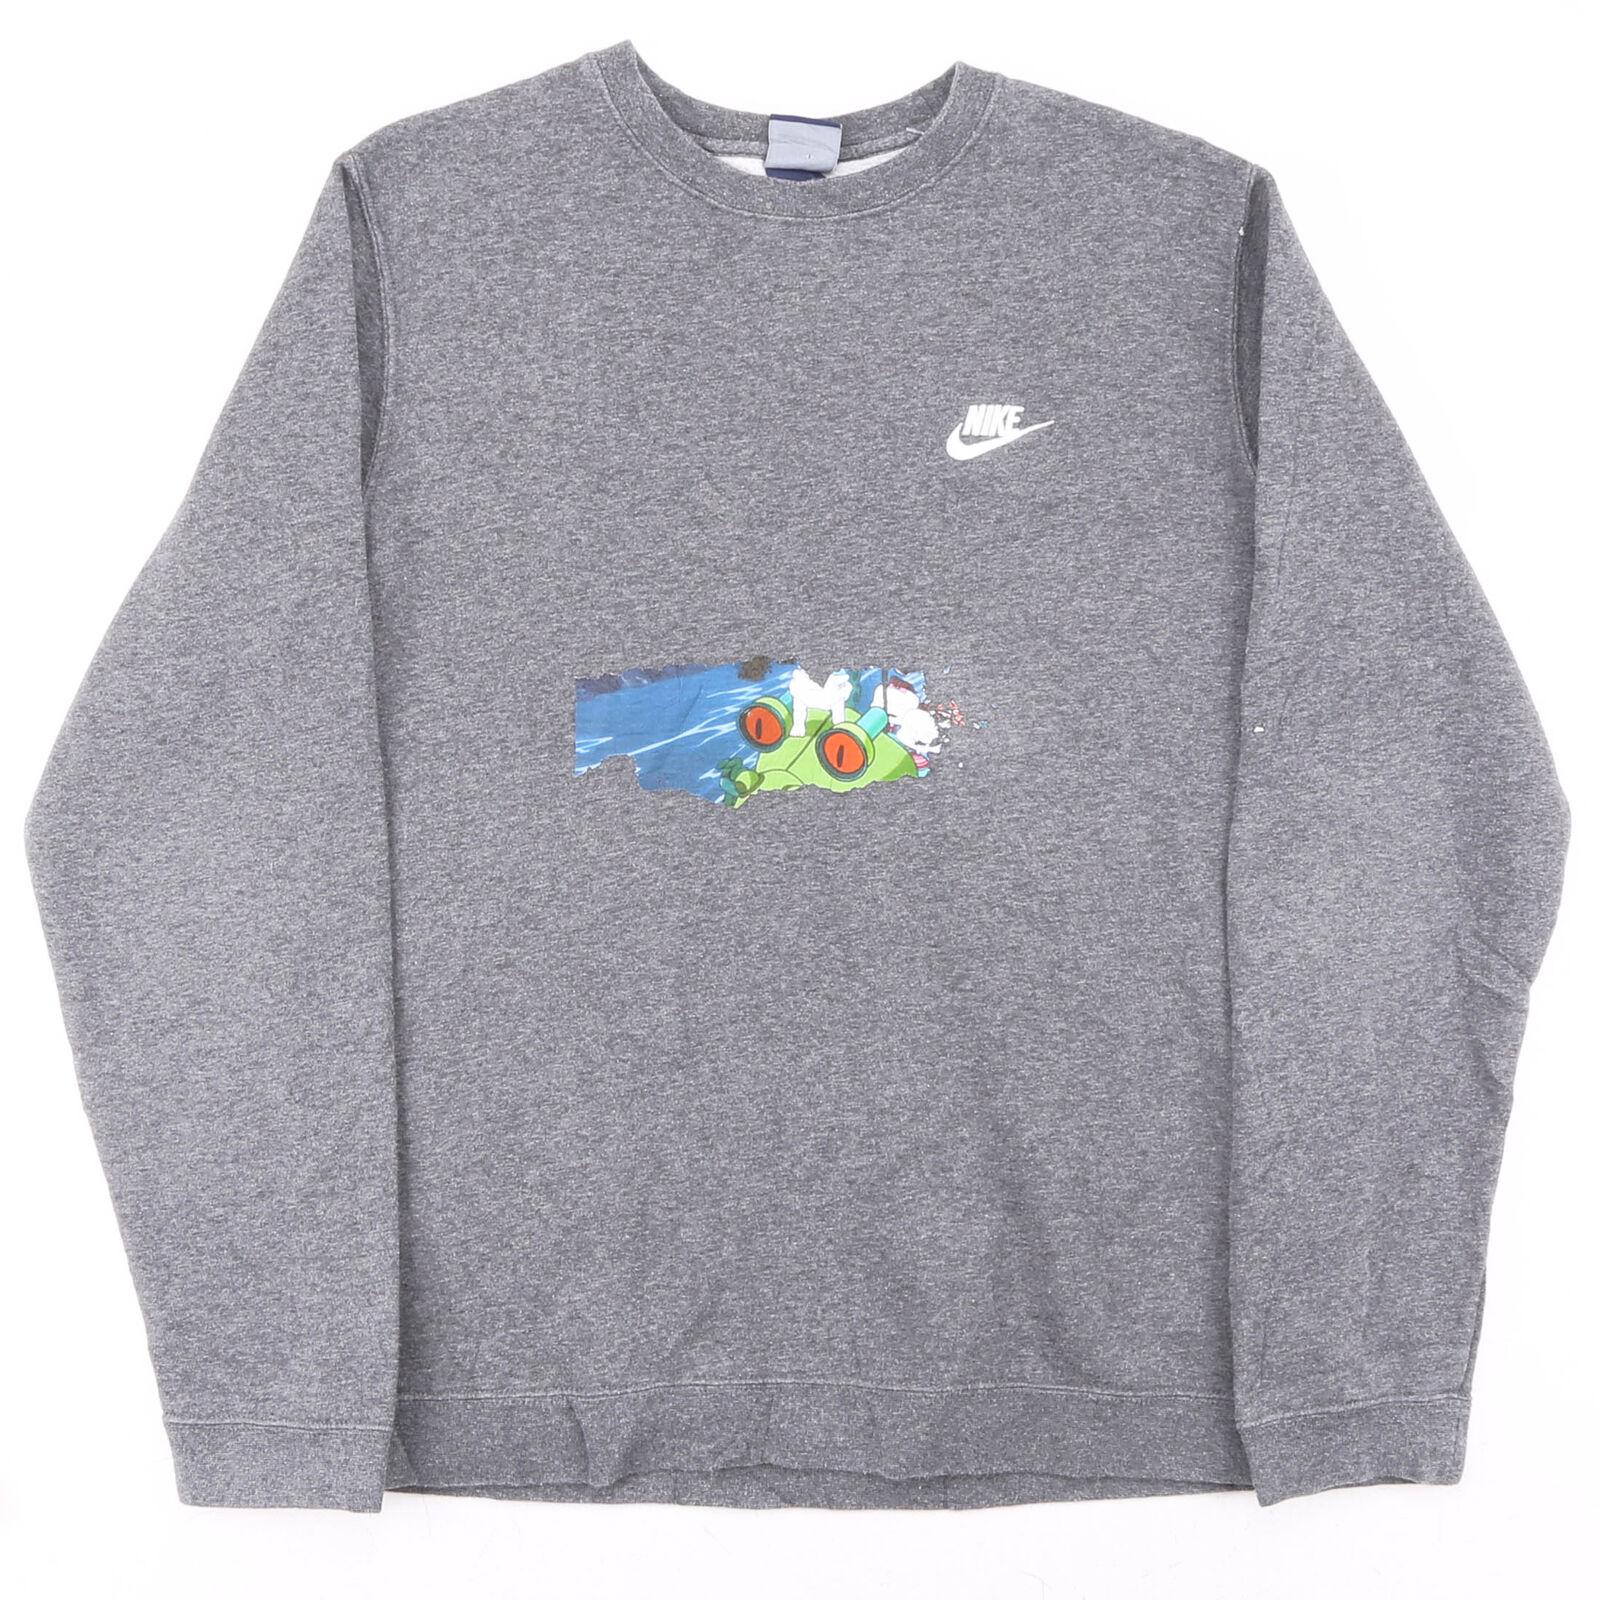 NIKE Grey Classic Crew Neck Sweatshirt Mens M